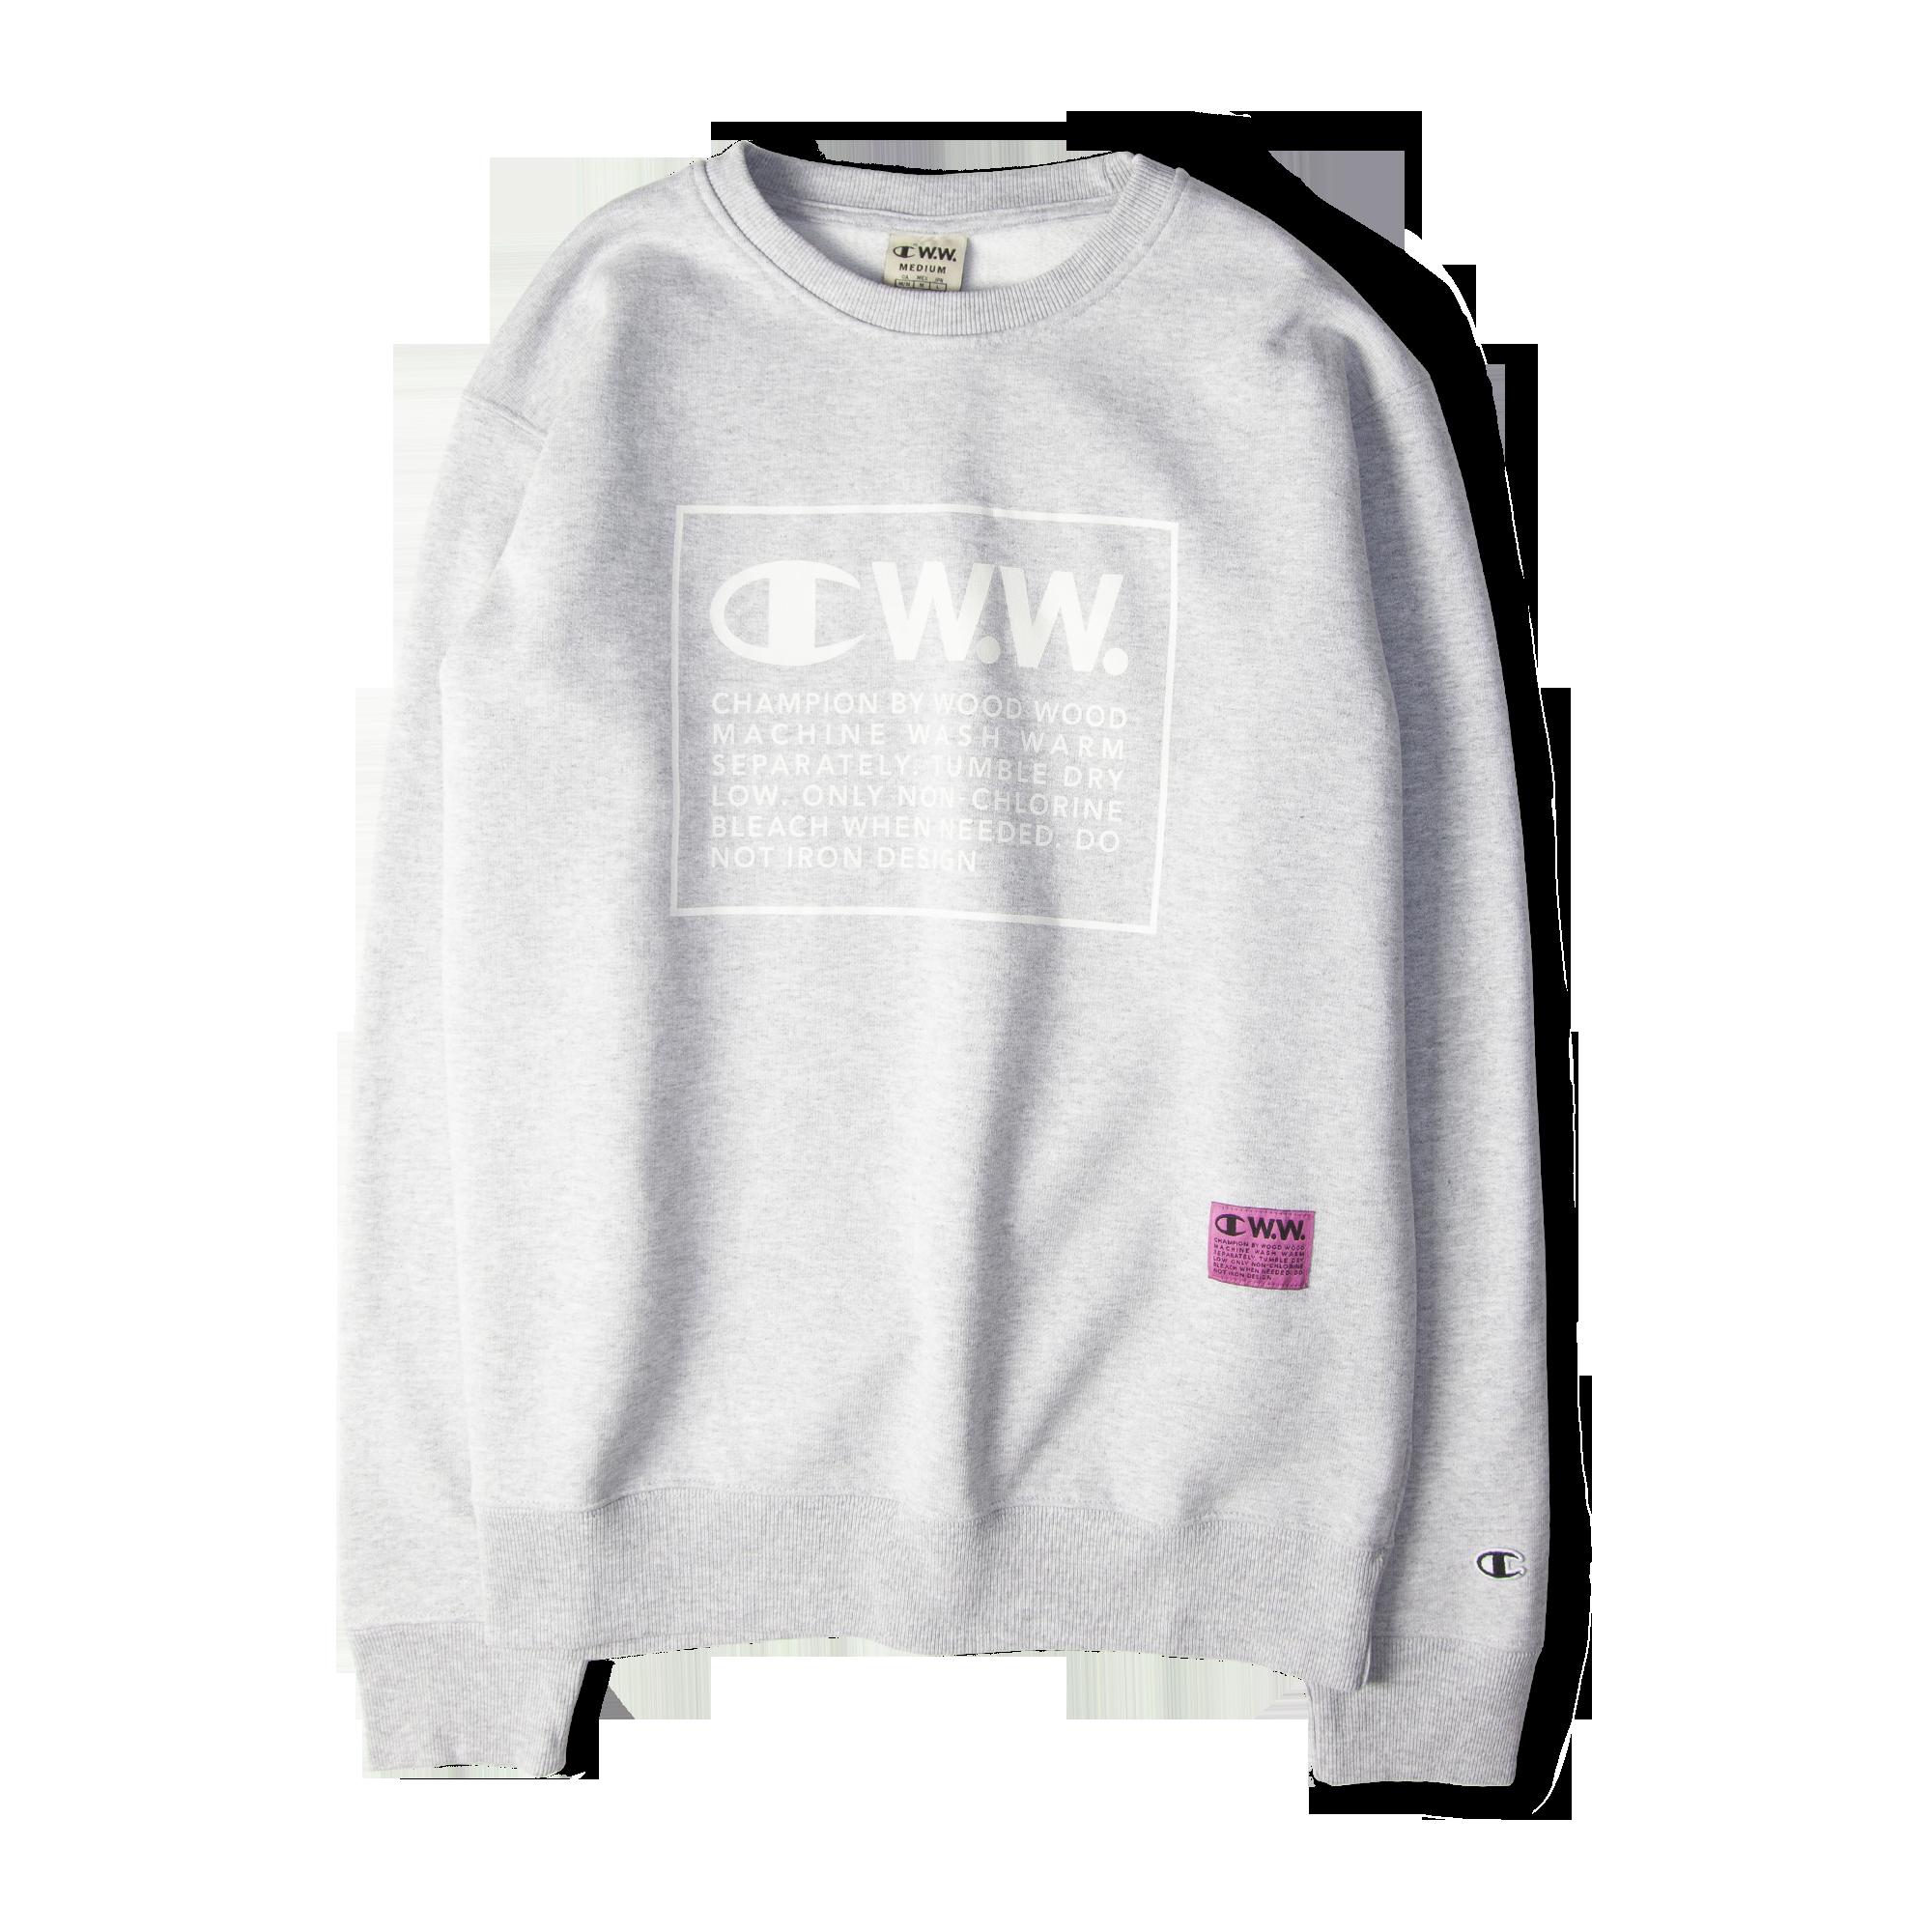 b723a320d354 Champion X Wood Wood Box Logo Crewneck Sweatshirt Grey Free SHIPPING OVER  £50.00 #grants #1856 #grants1856